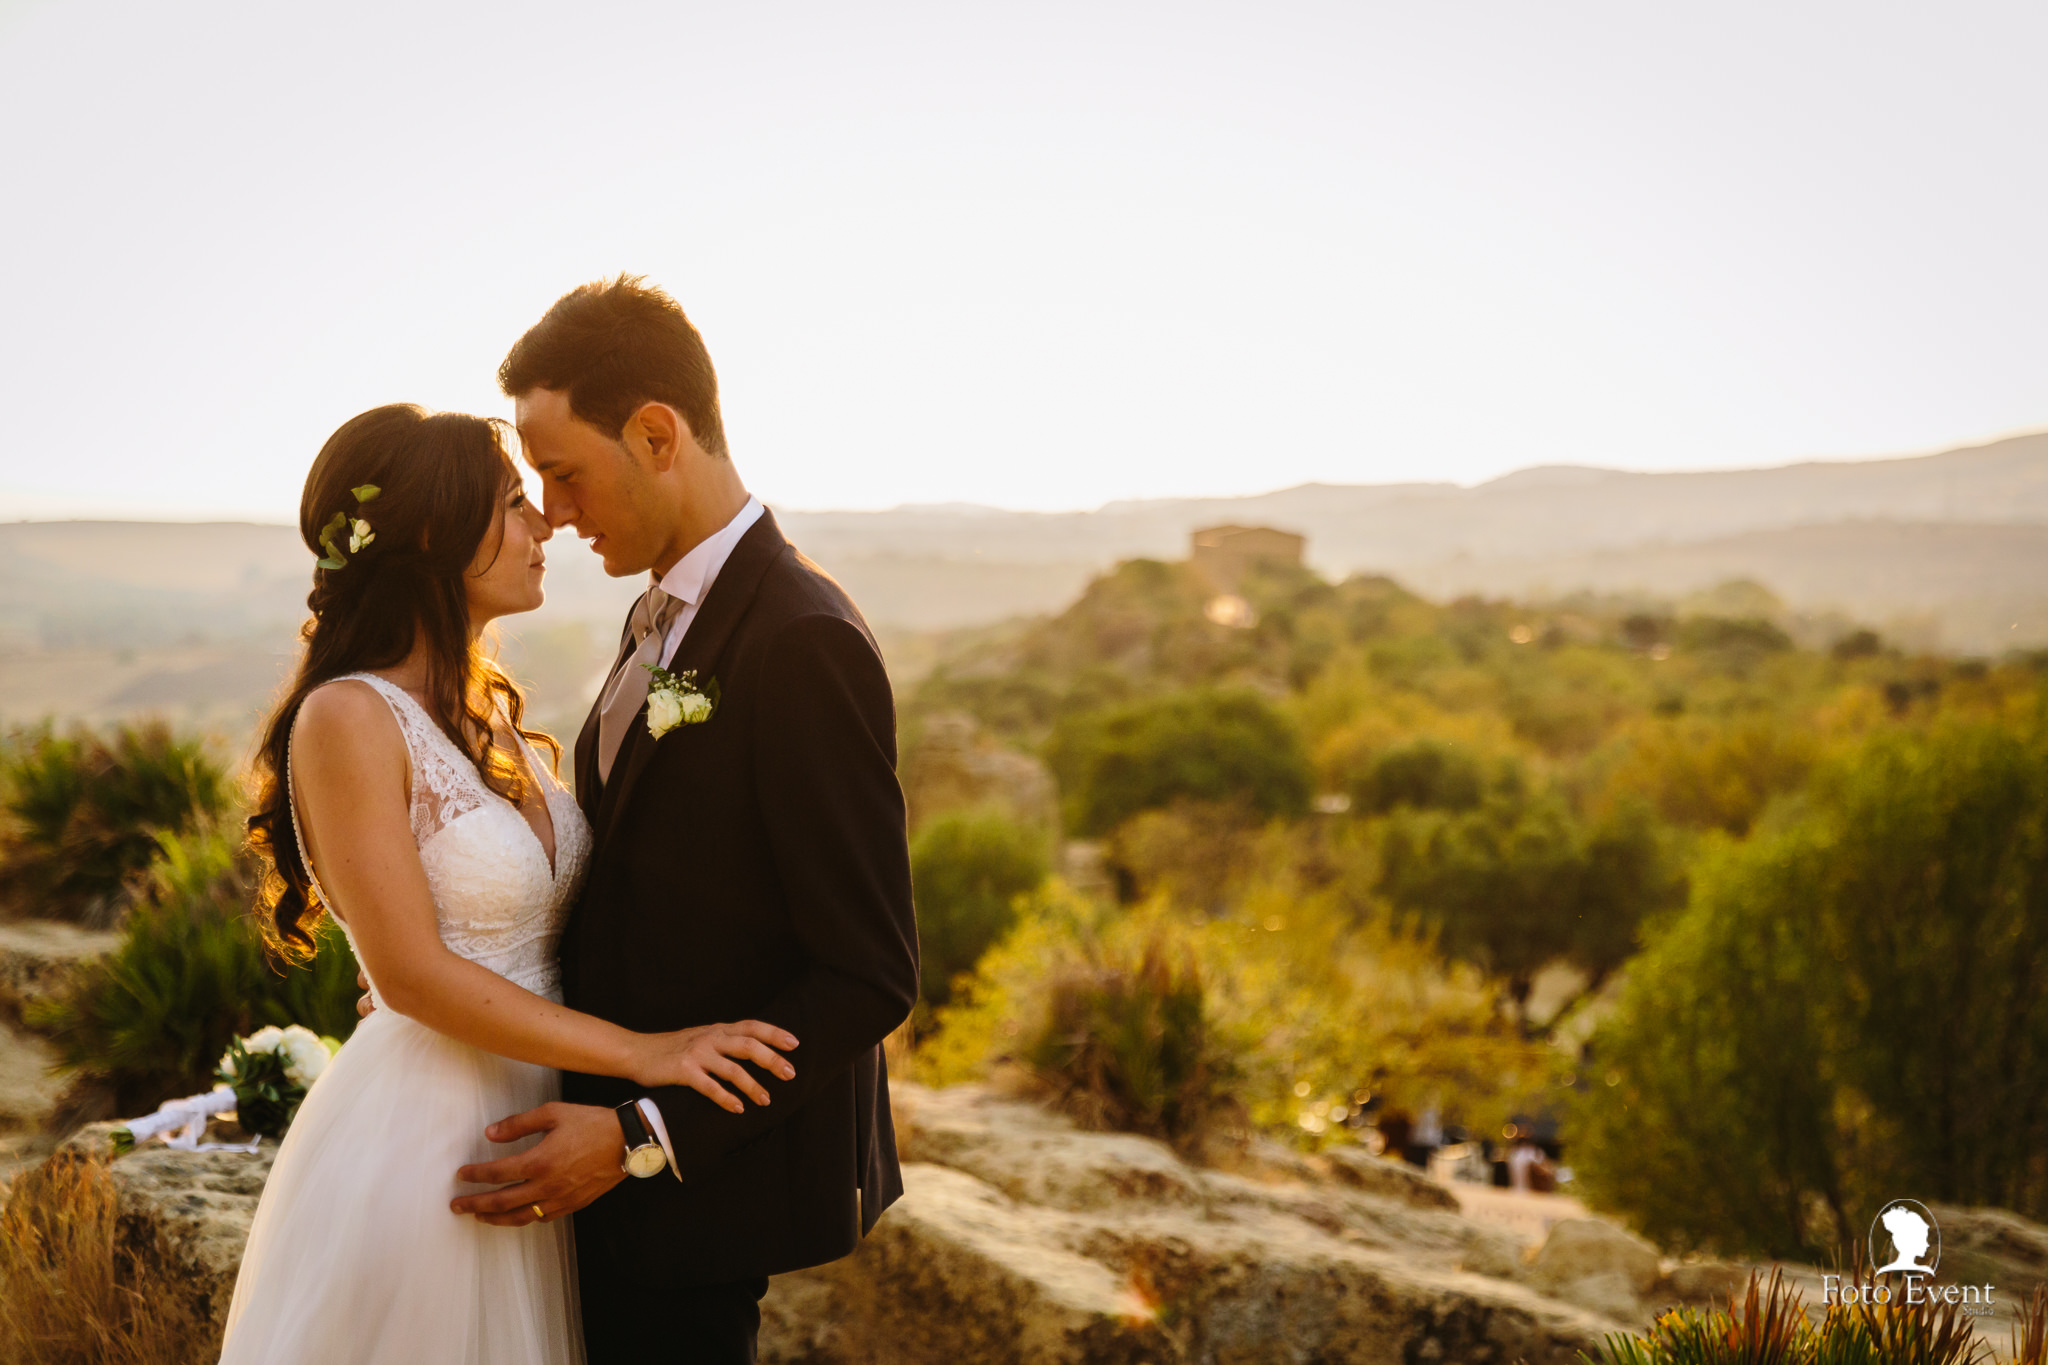 037-2019-08-23-Matrimonio-Lucia-e-Rosario-Scopelliti-5DE-1836